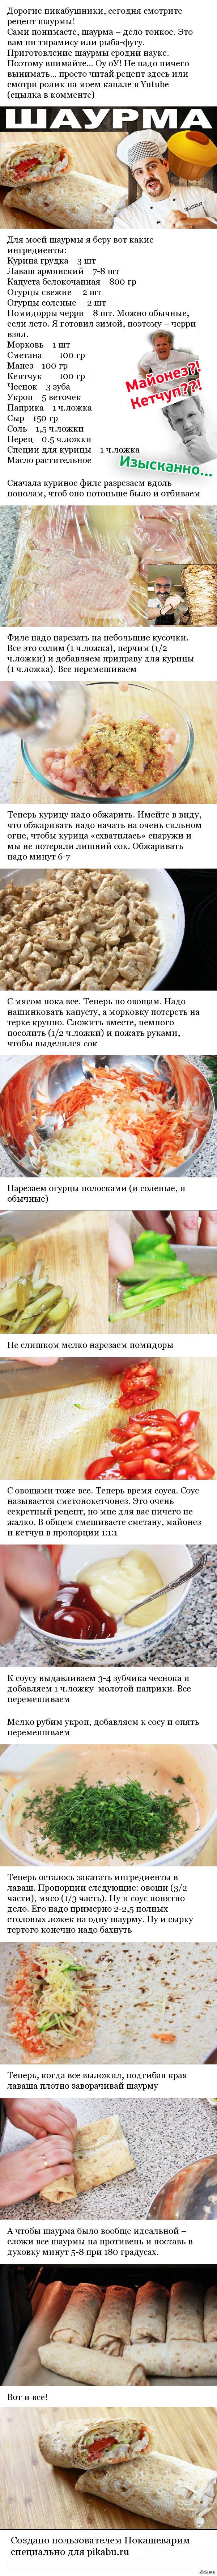 Мясо для шаурмы в домашних условиях рецепт